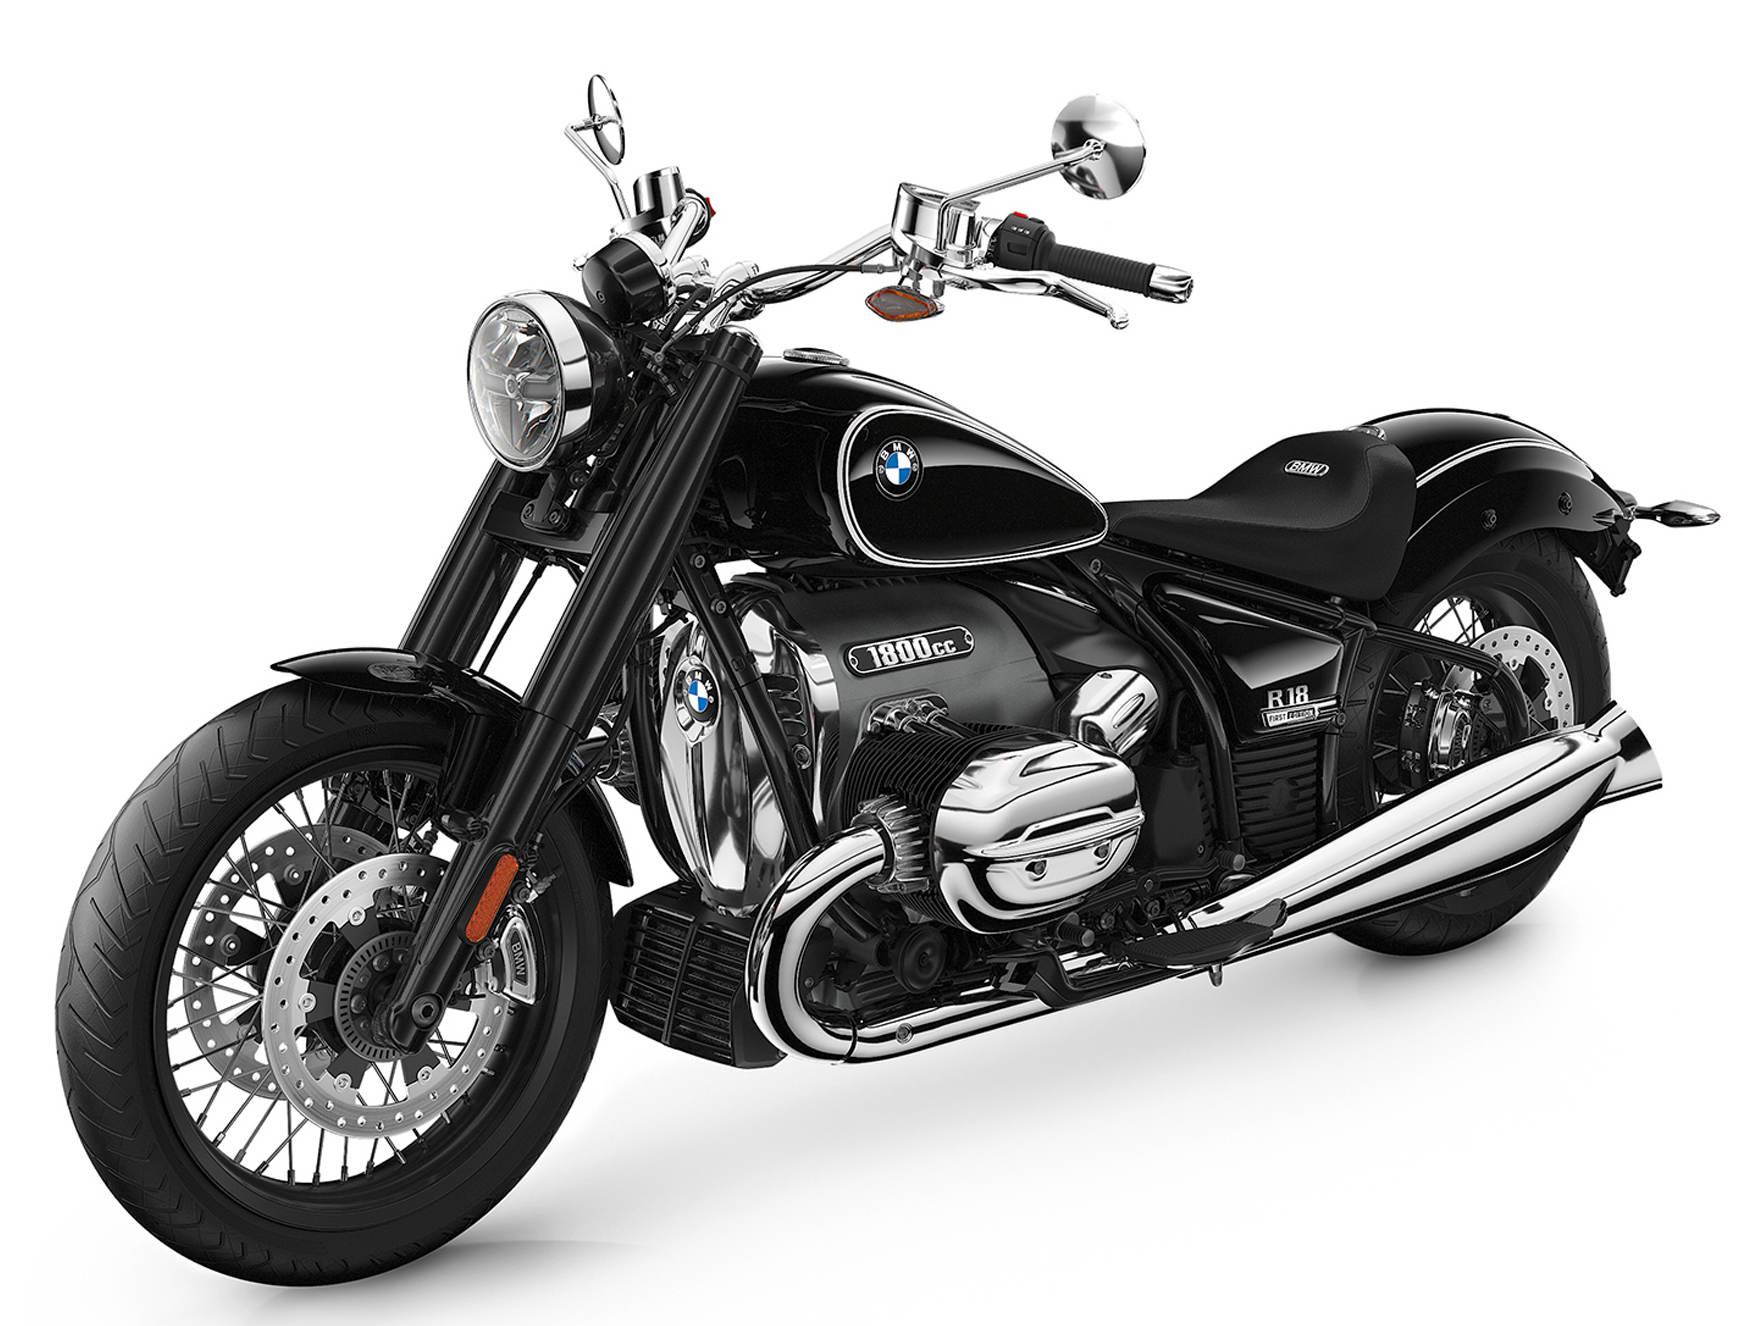 BMW 1800ccボクサーツインエンジン搭載クルーザー R18を正式発表